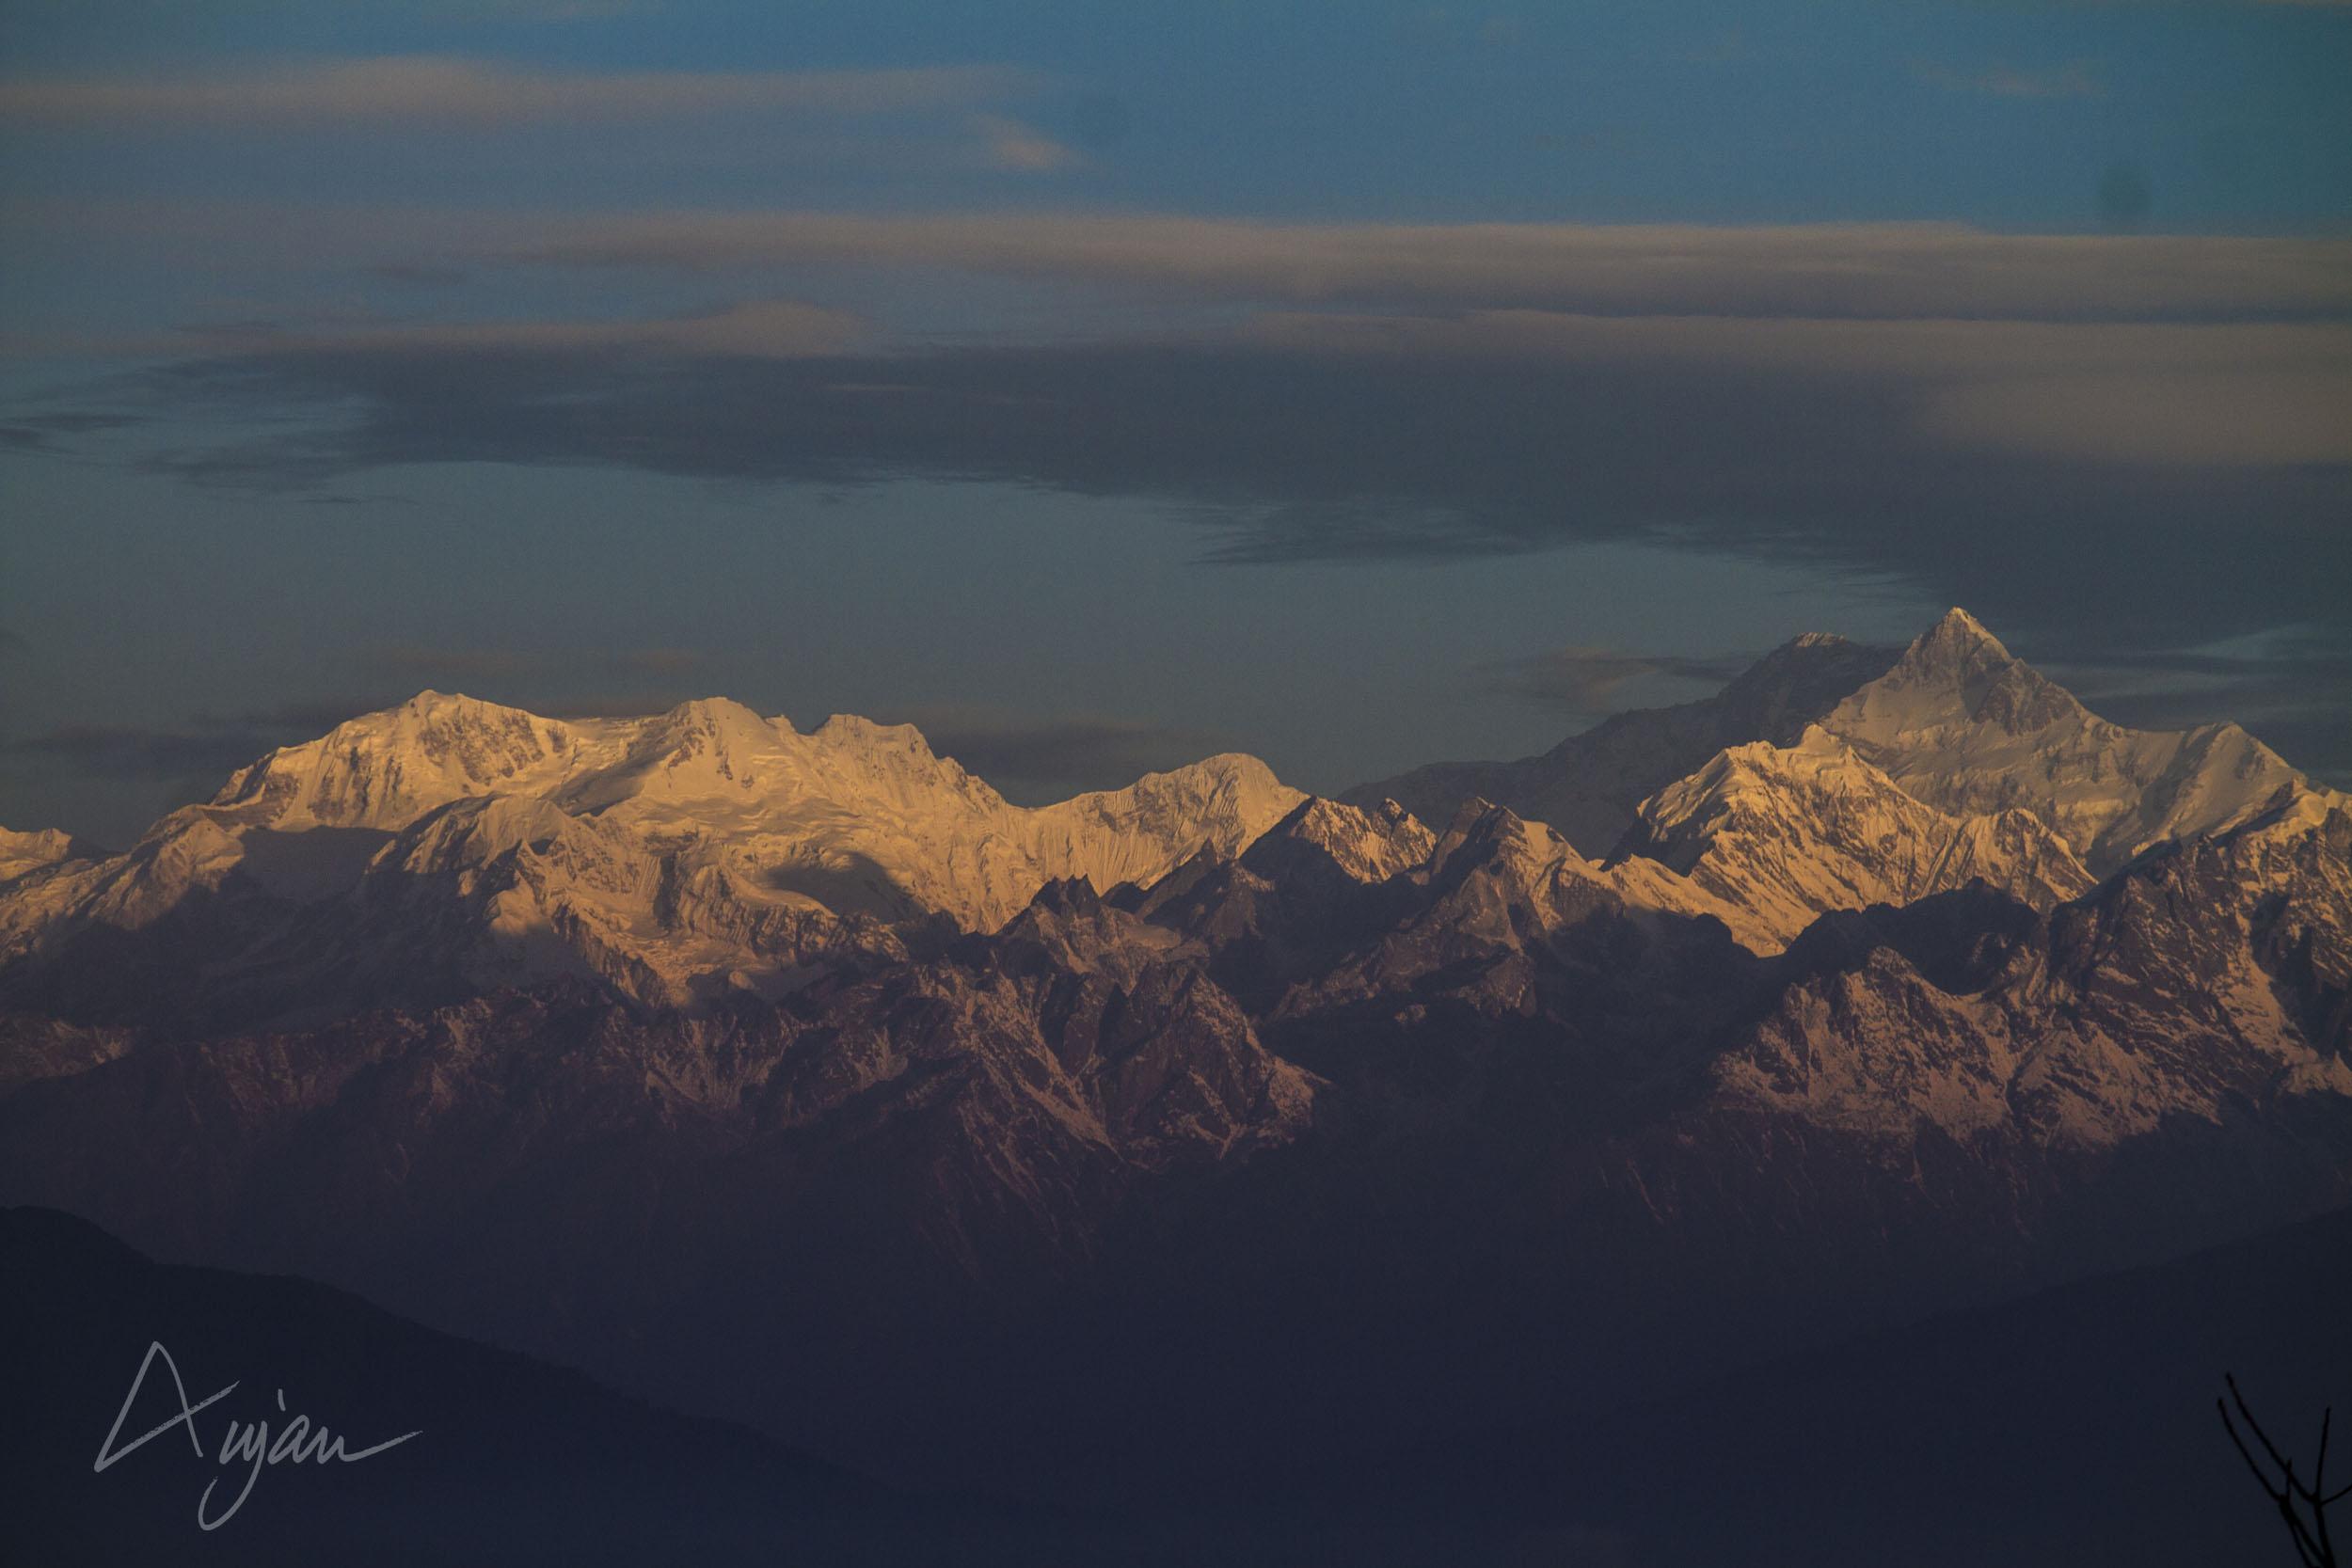 Himalayas at Sunset. Copyright image by Anjan Ghosh